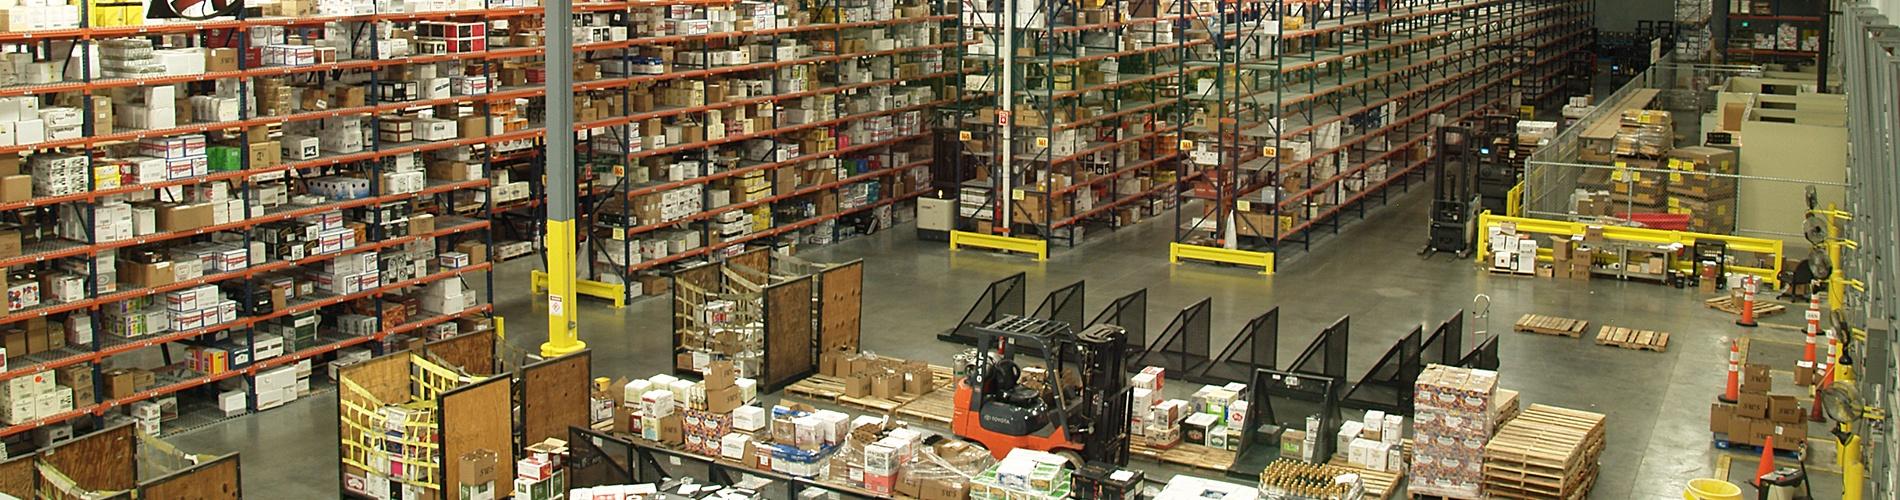 Wholesale Distribution Software Image